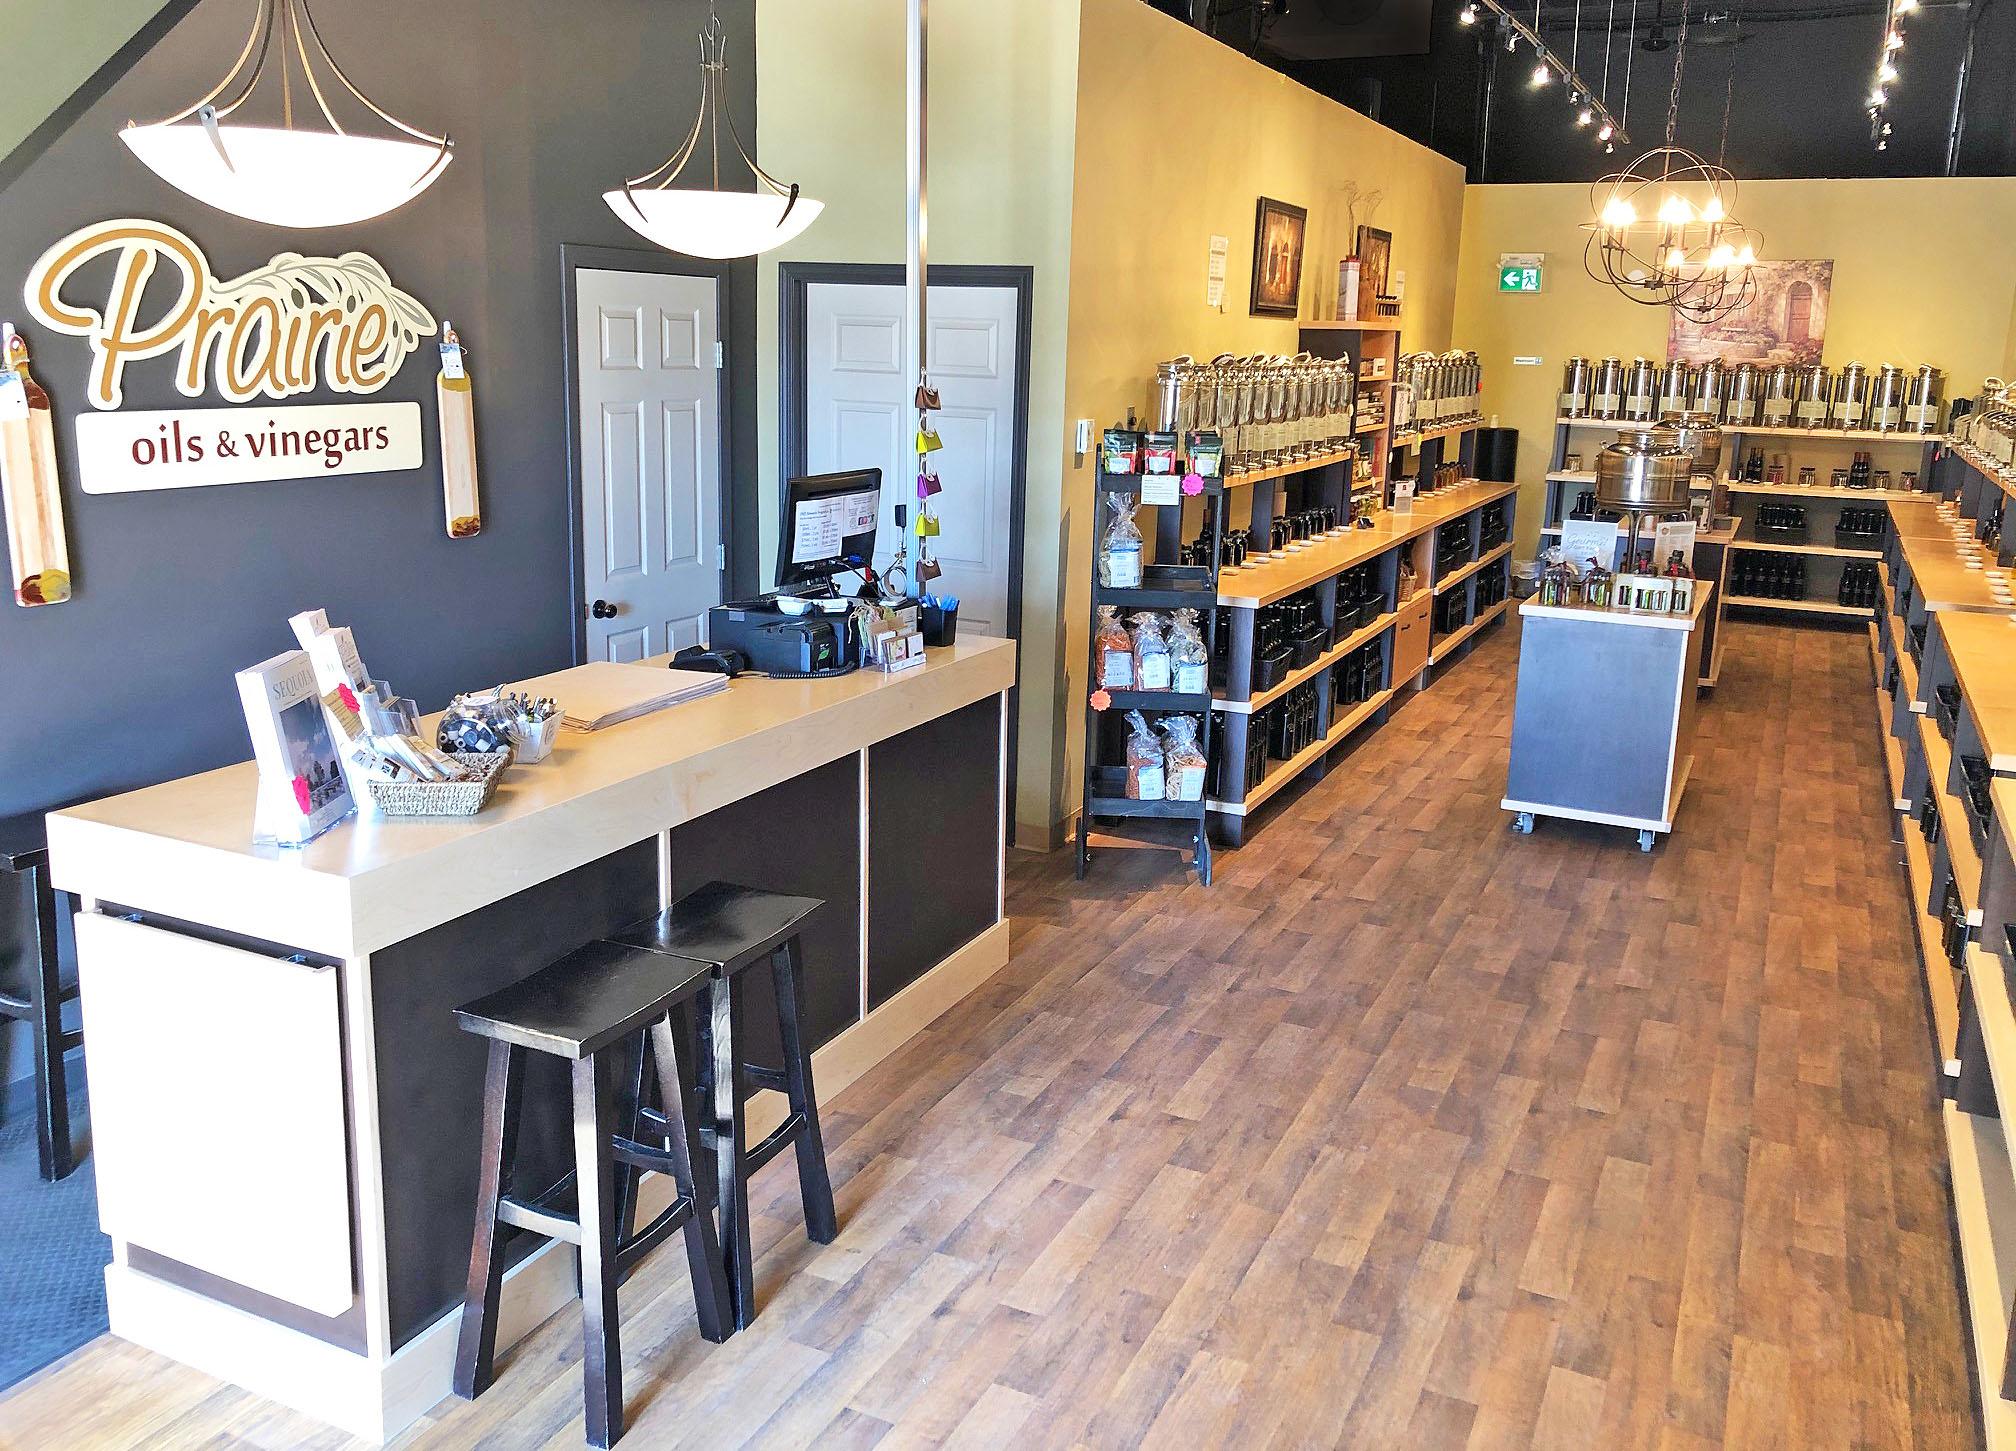 Prairie Oils & Vinegars Inc.